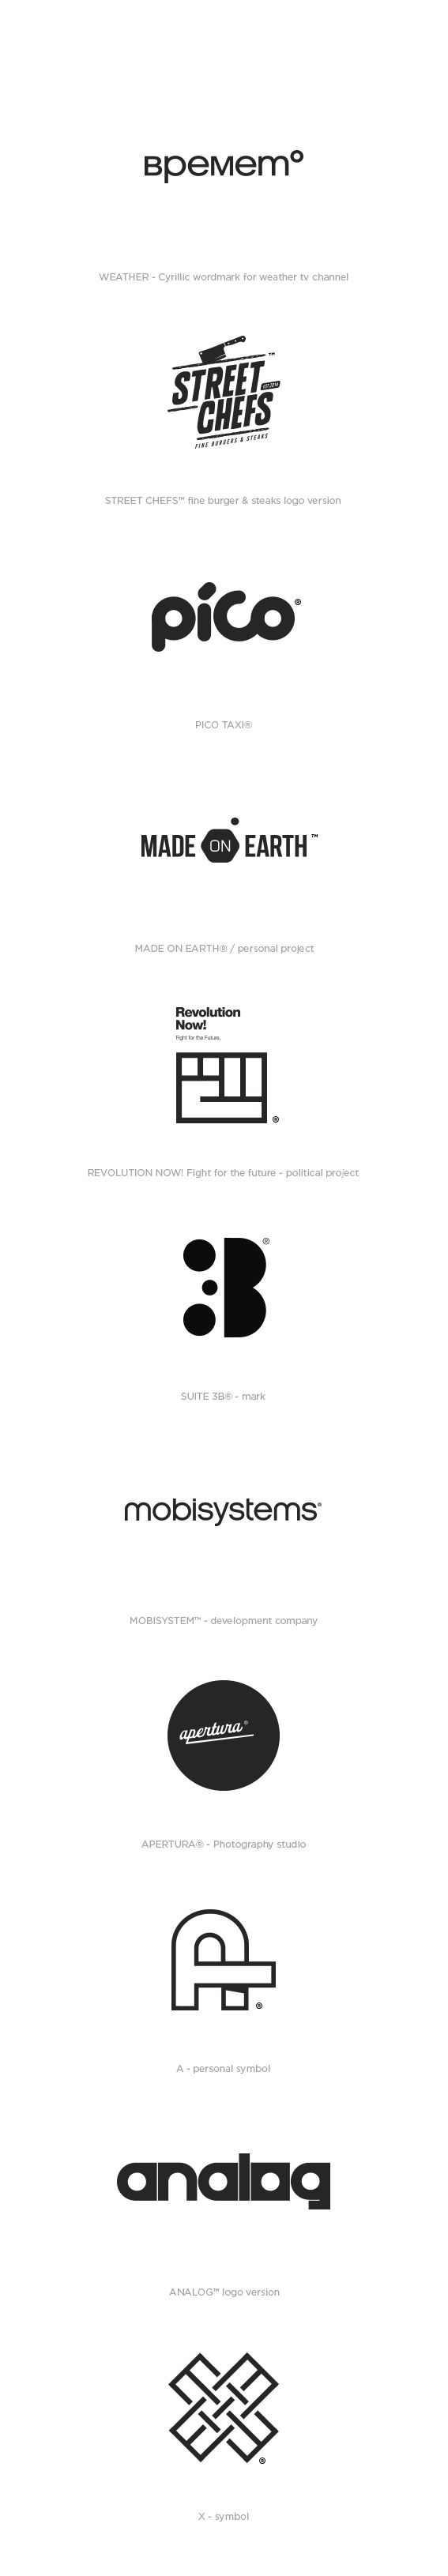 Marks & Logos 2014 on Behance